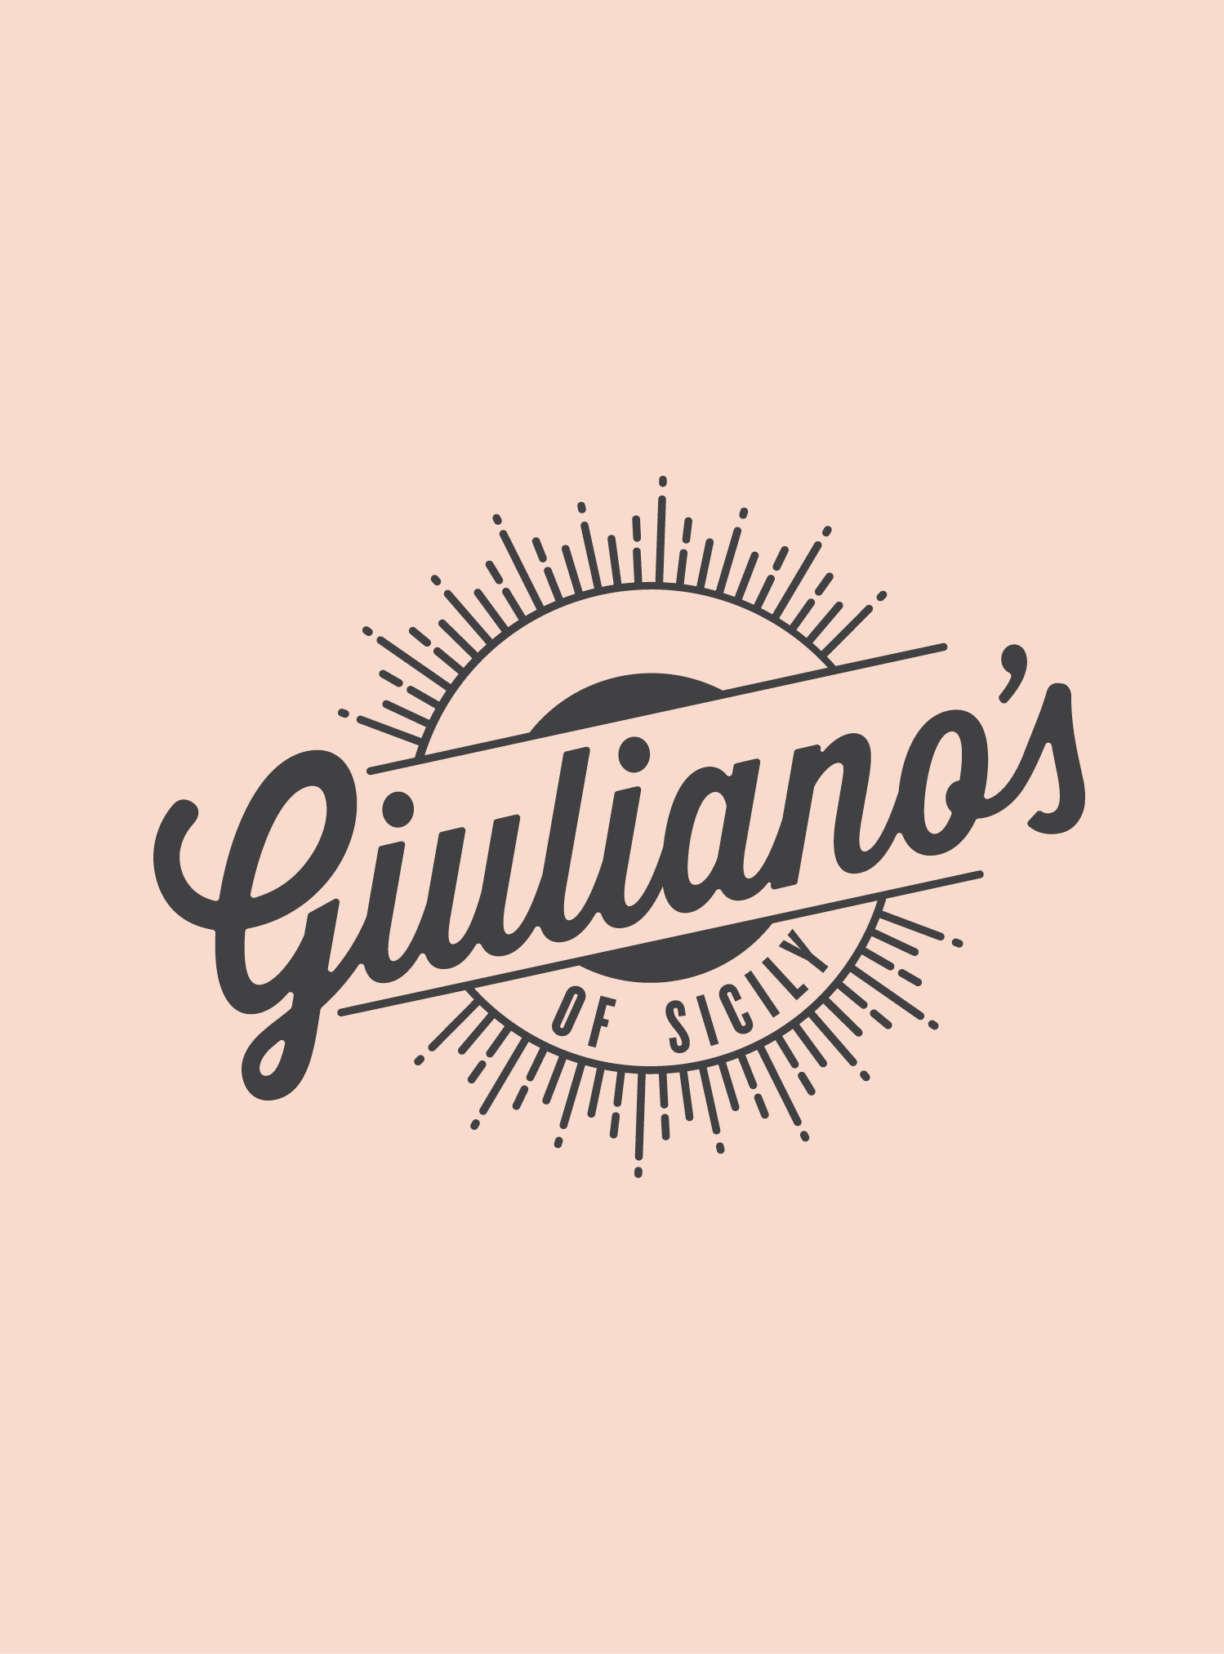 Giulianos-logo-update